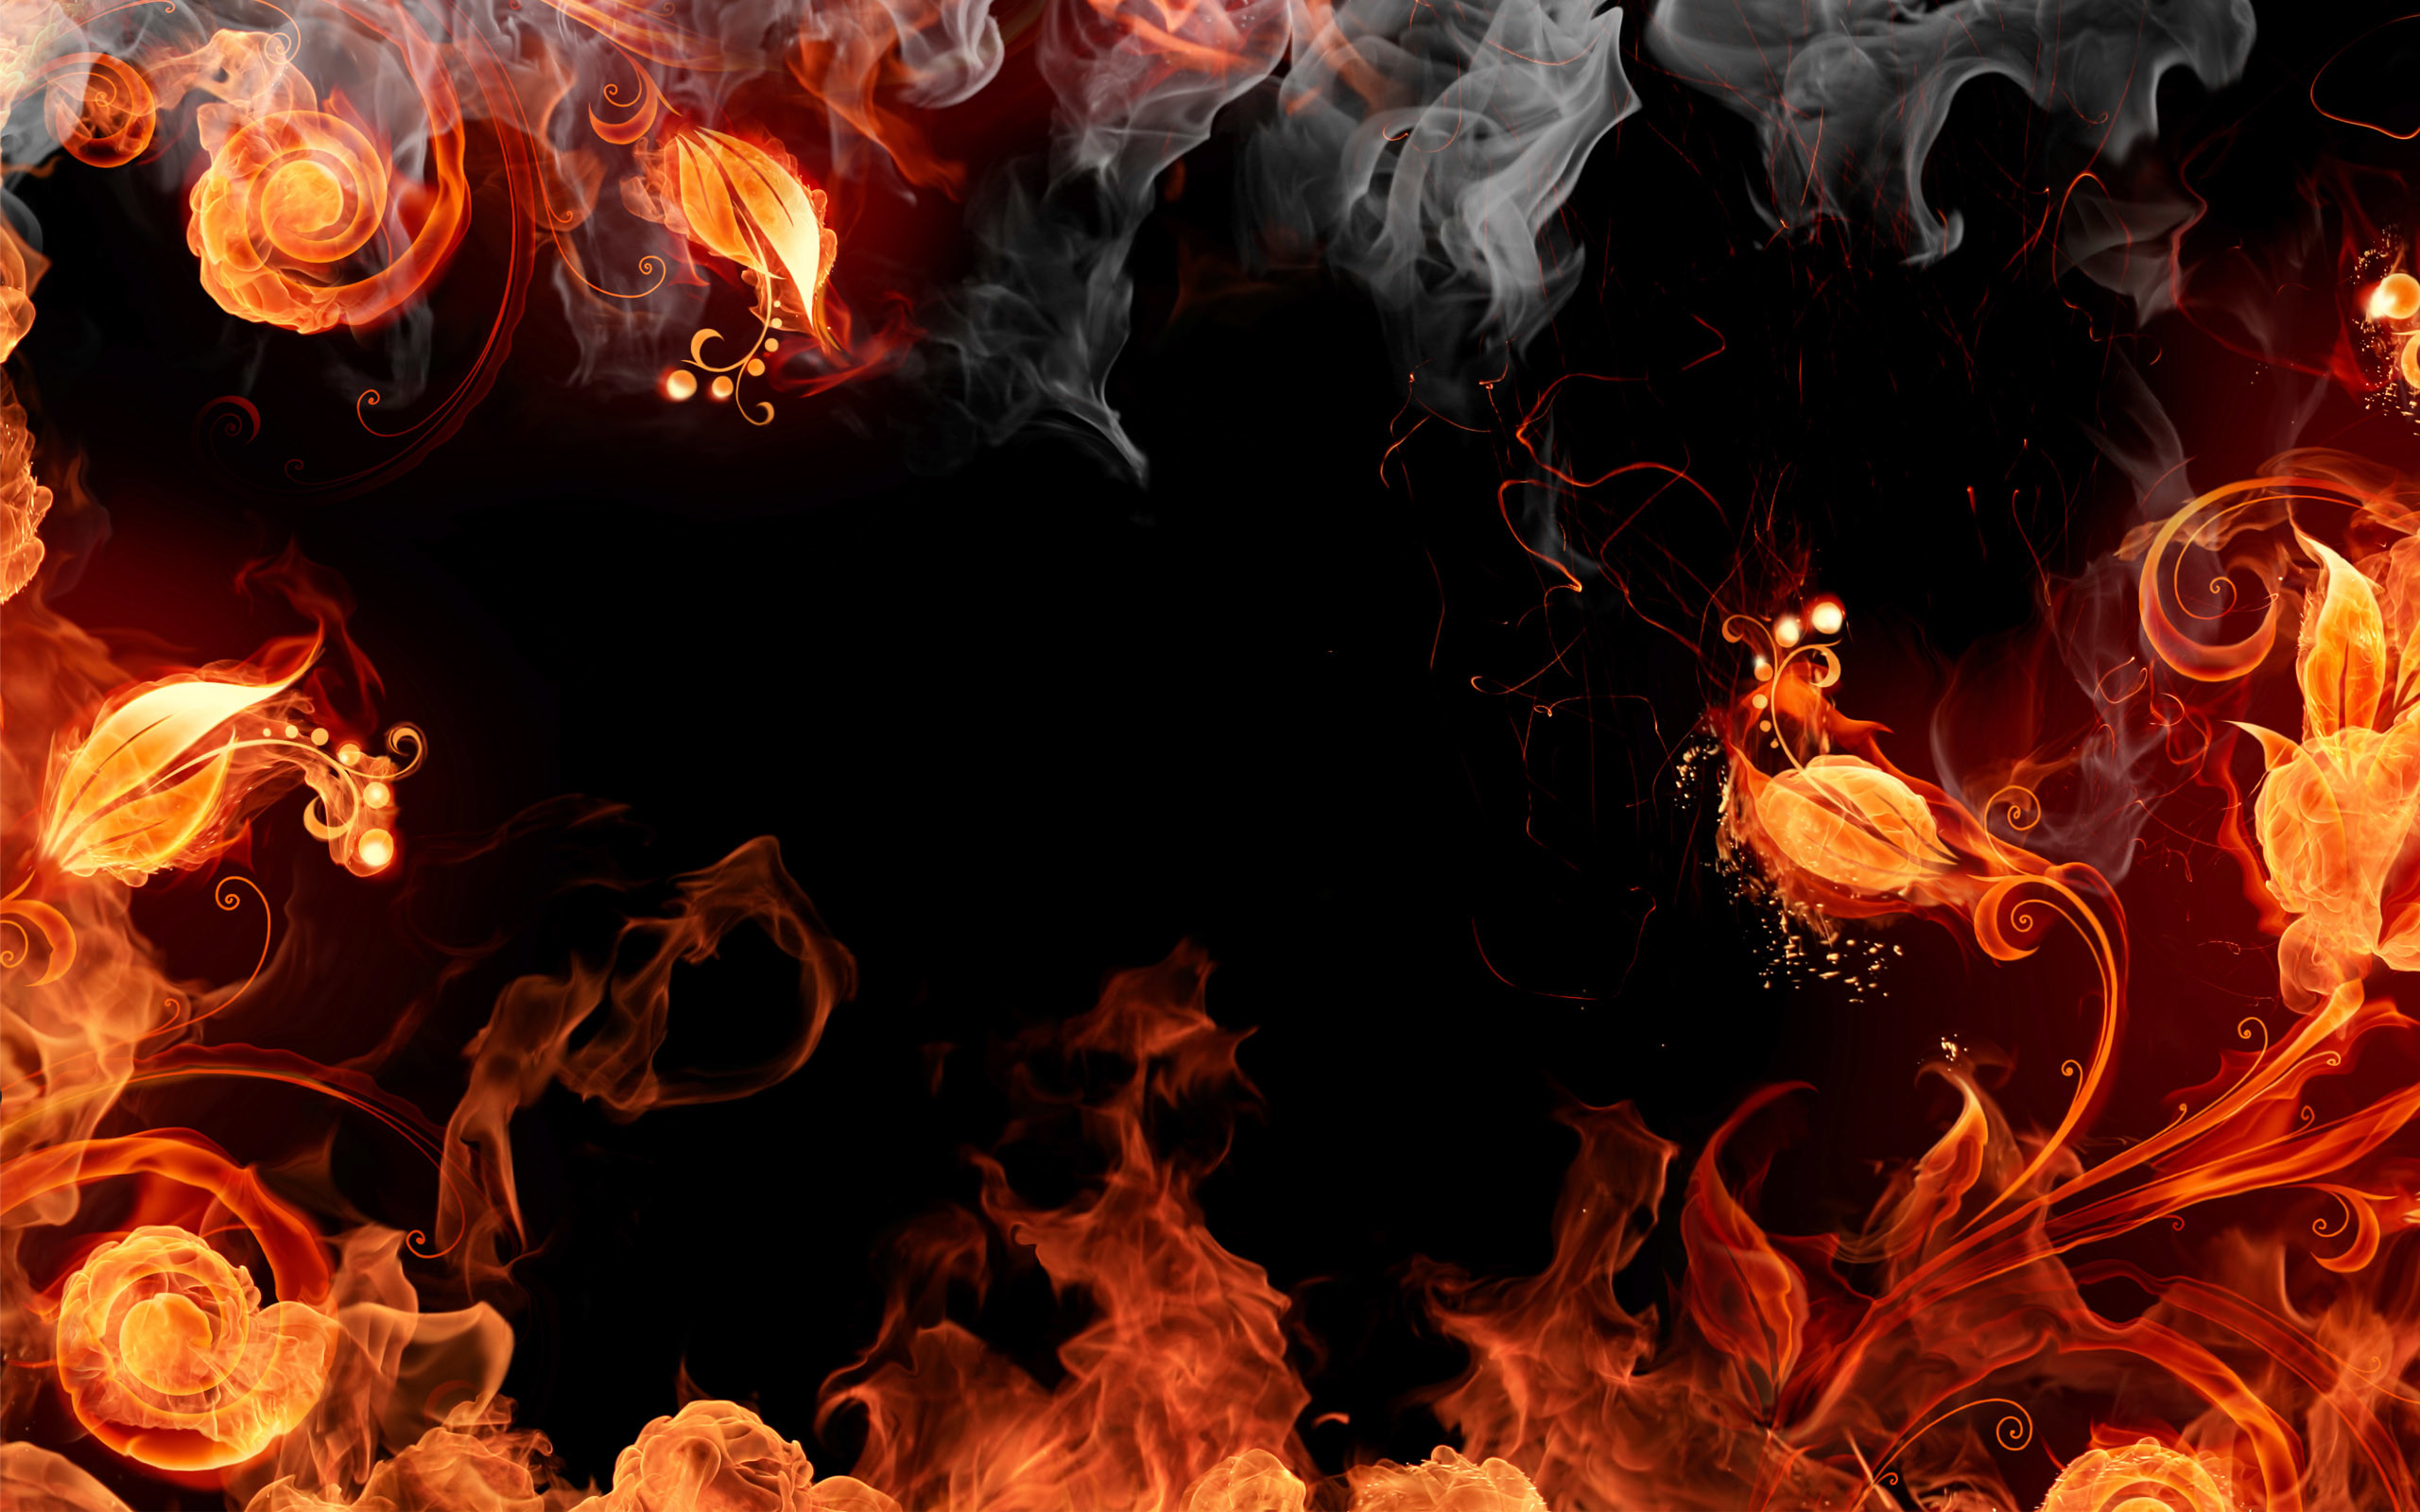 Fire Design HD Wide Wallpapers | HD Wallpapers